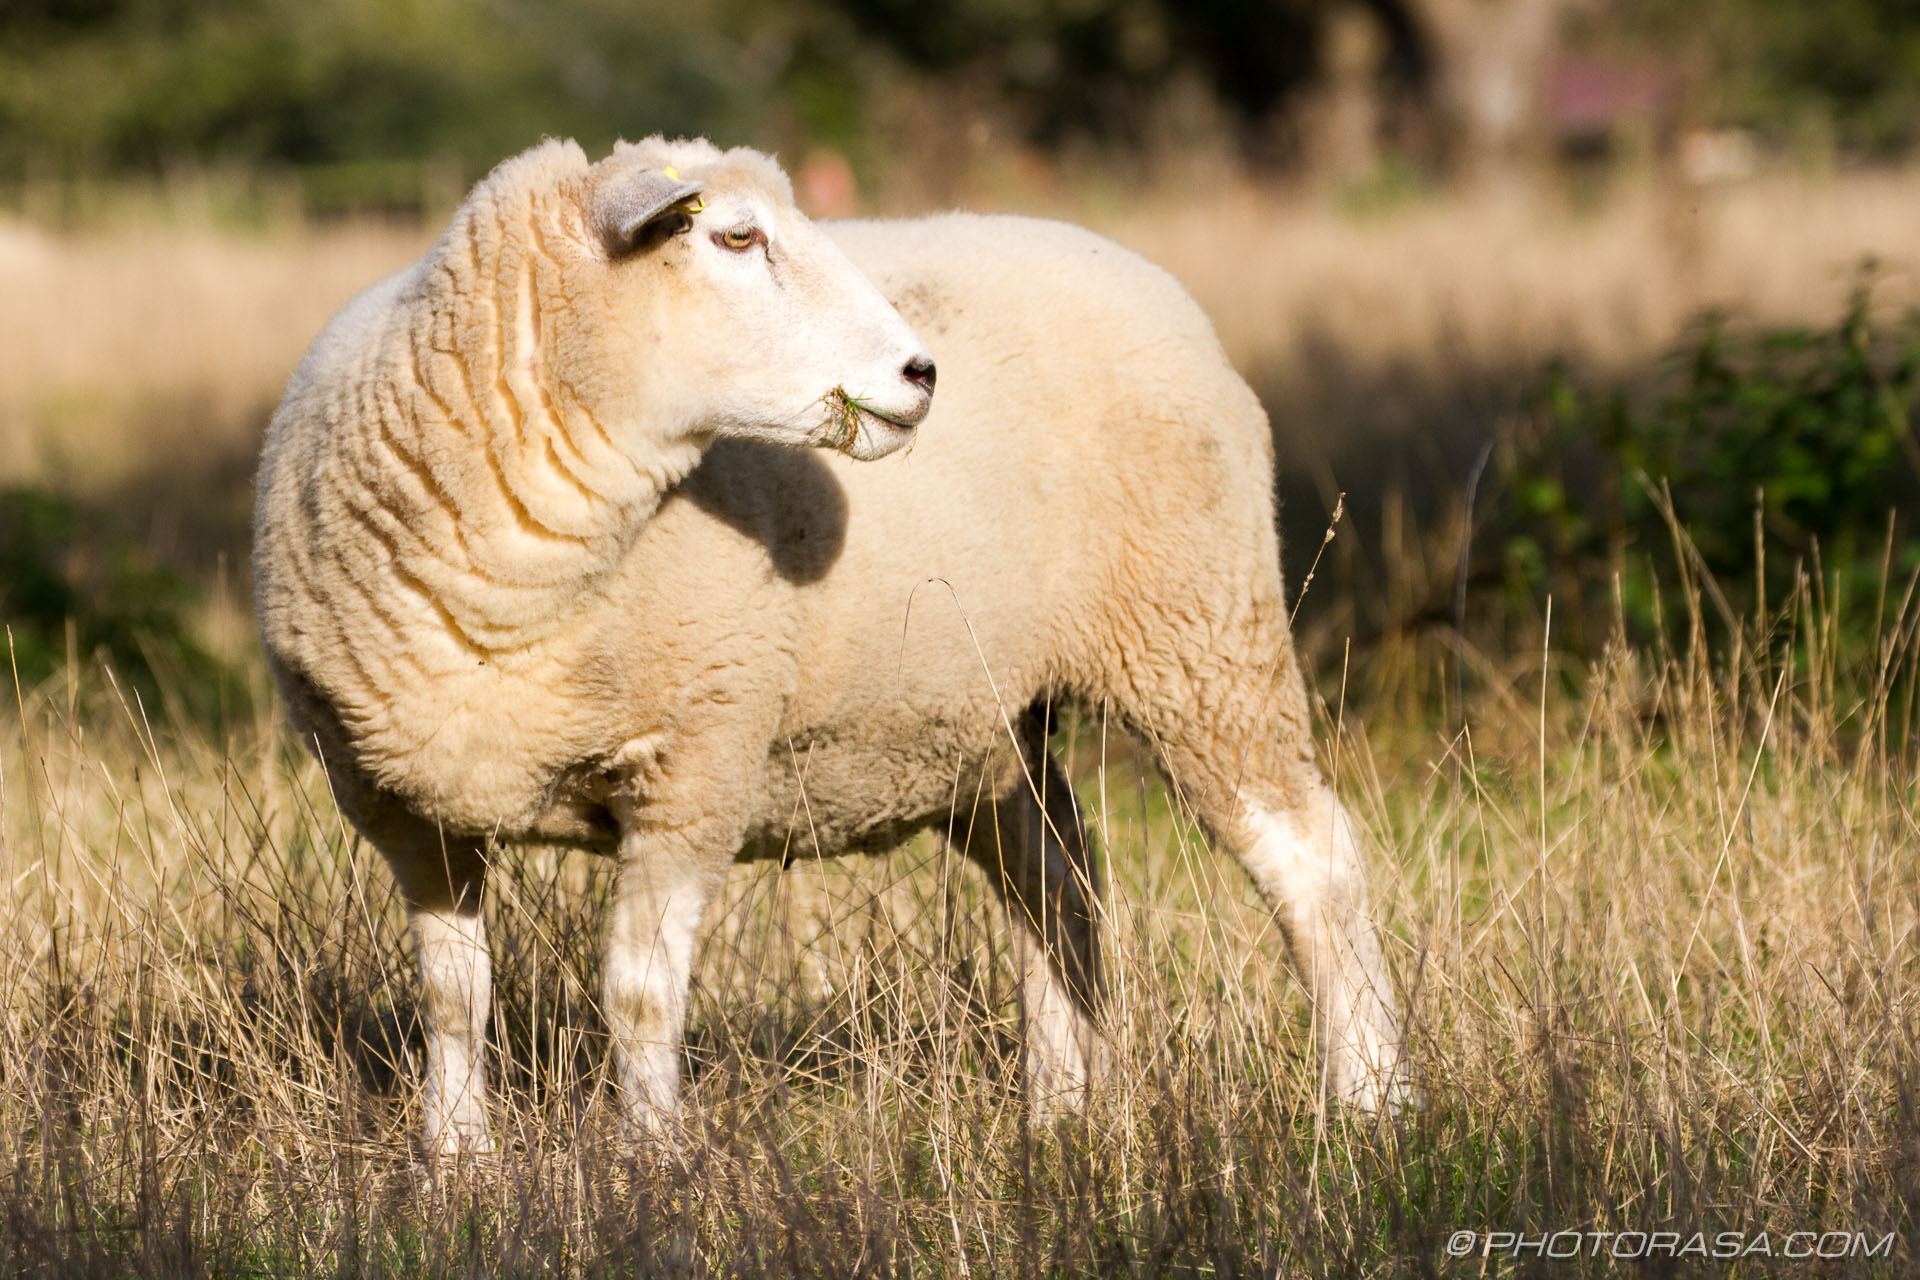 http://photorasa.com/sheep/sheep-turned-to-look/